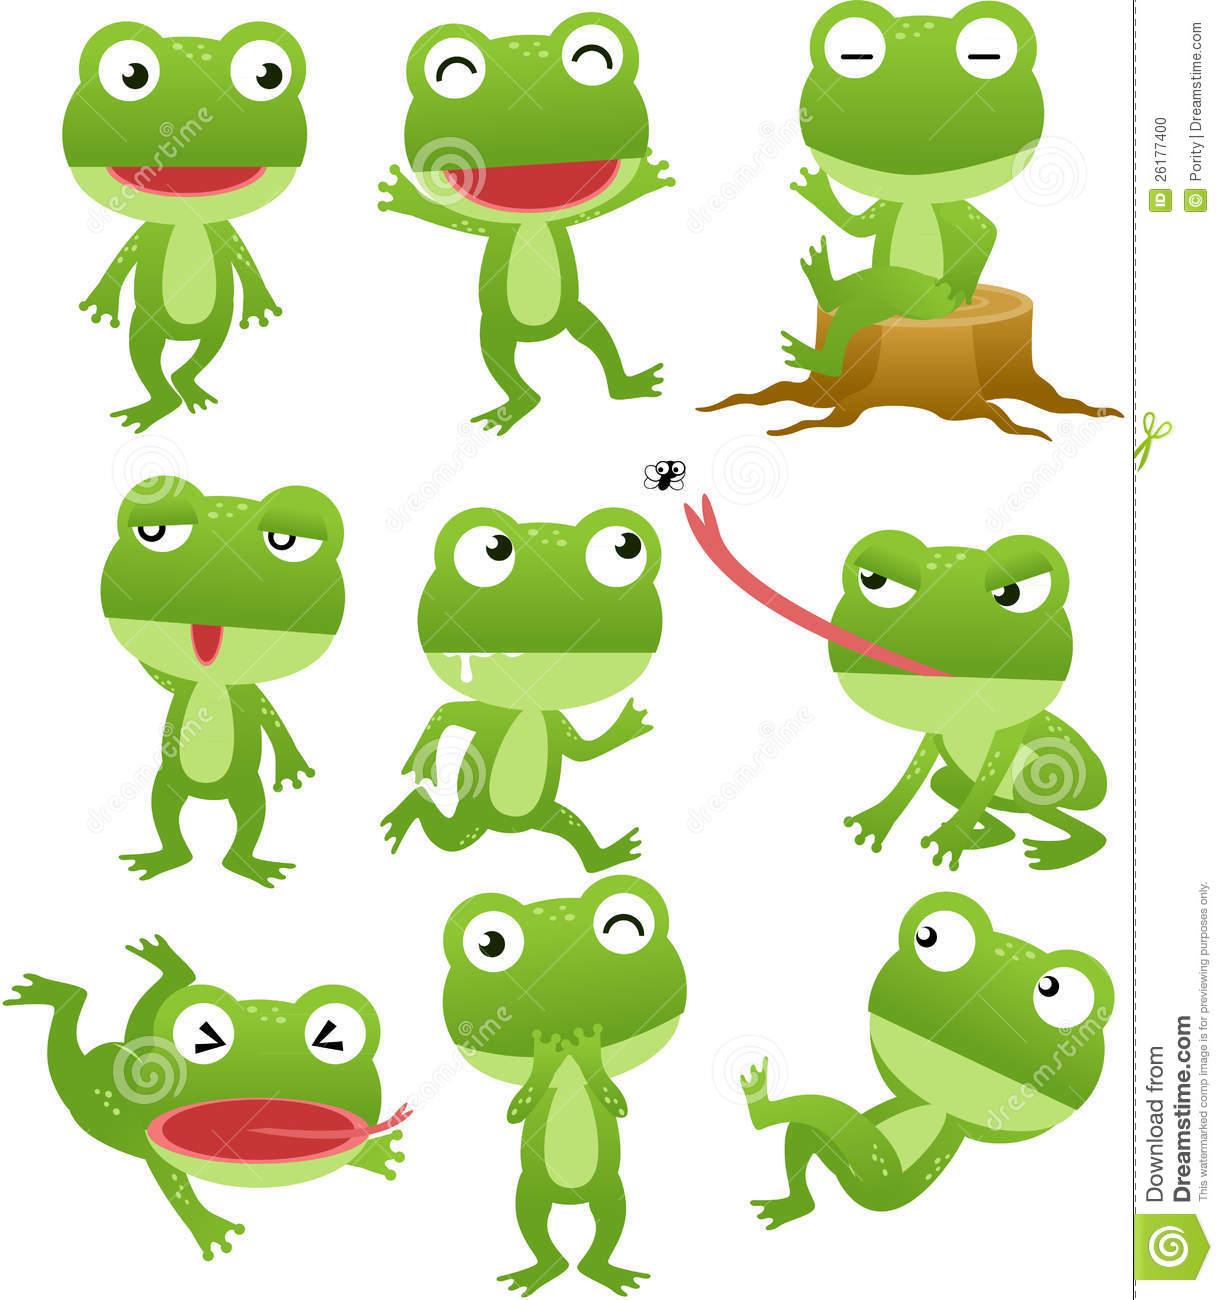 cartoon frog wallpaper 1223x1300